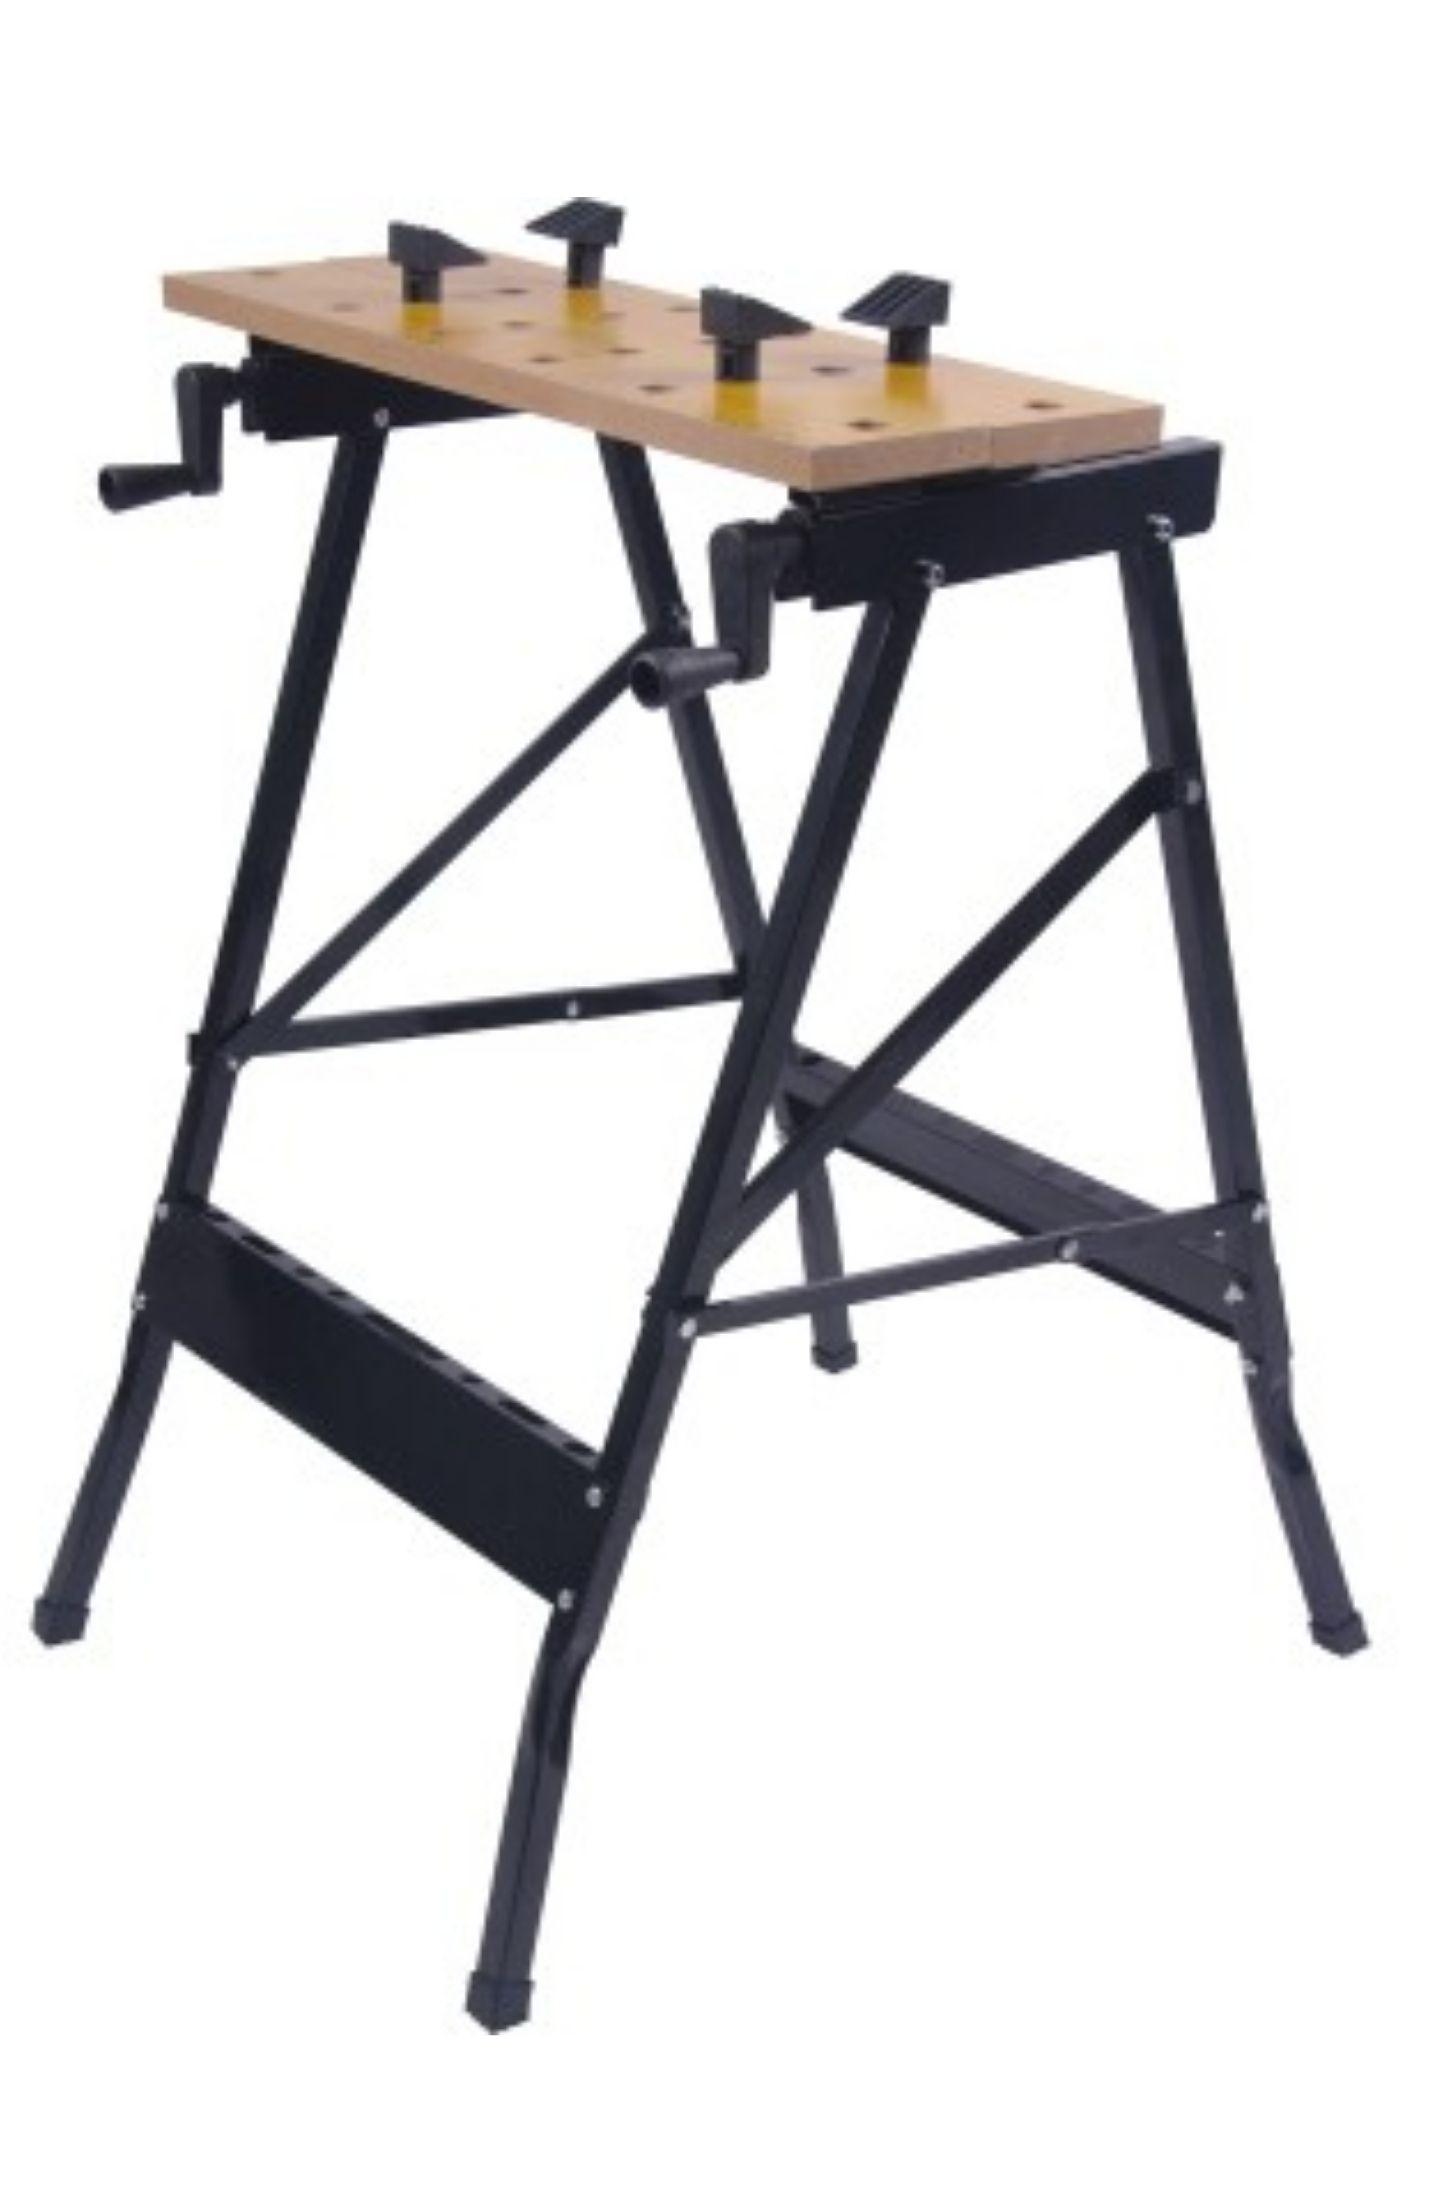 Work Bench 56x60x76cm - £8.39 @ JTF